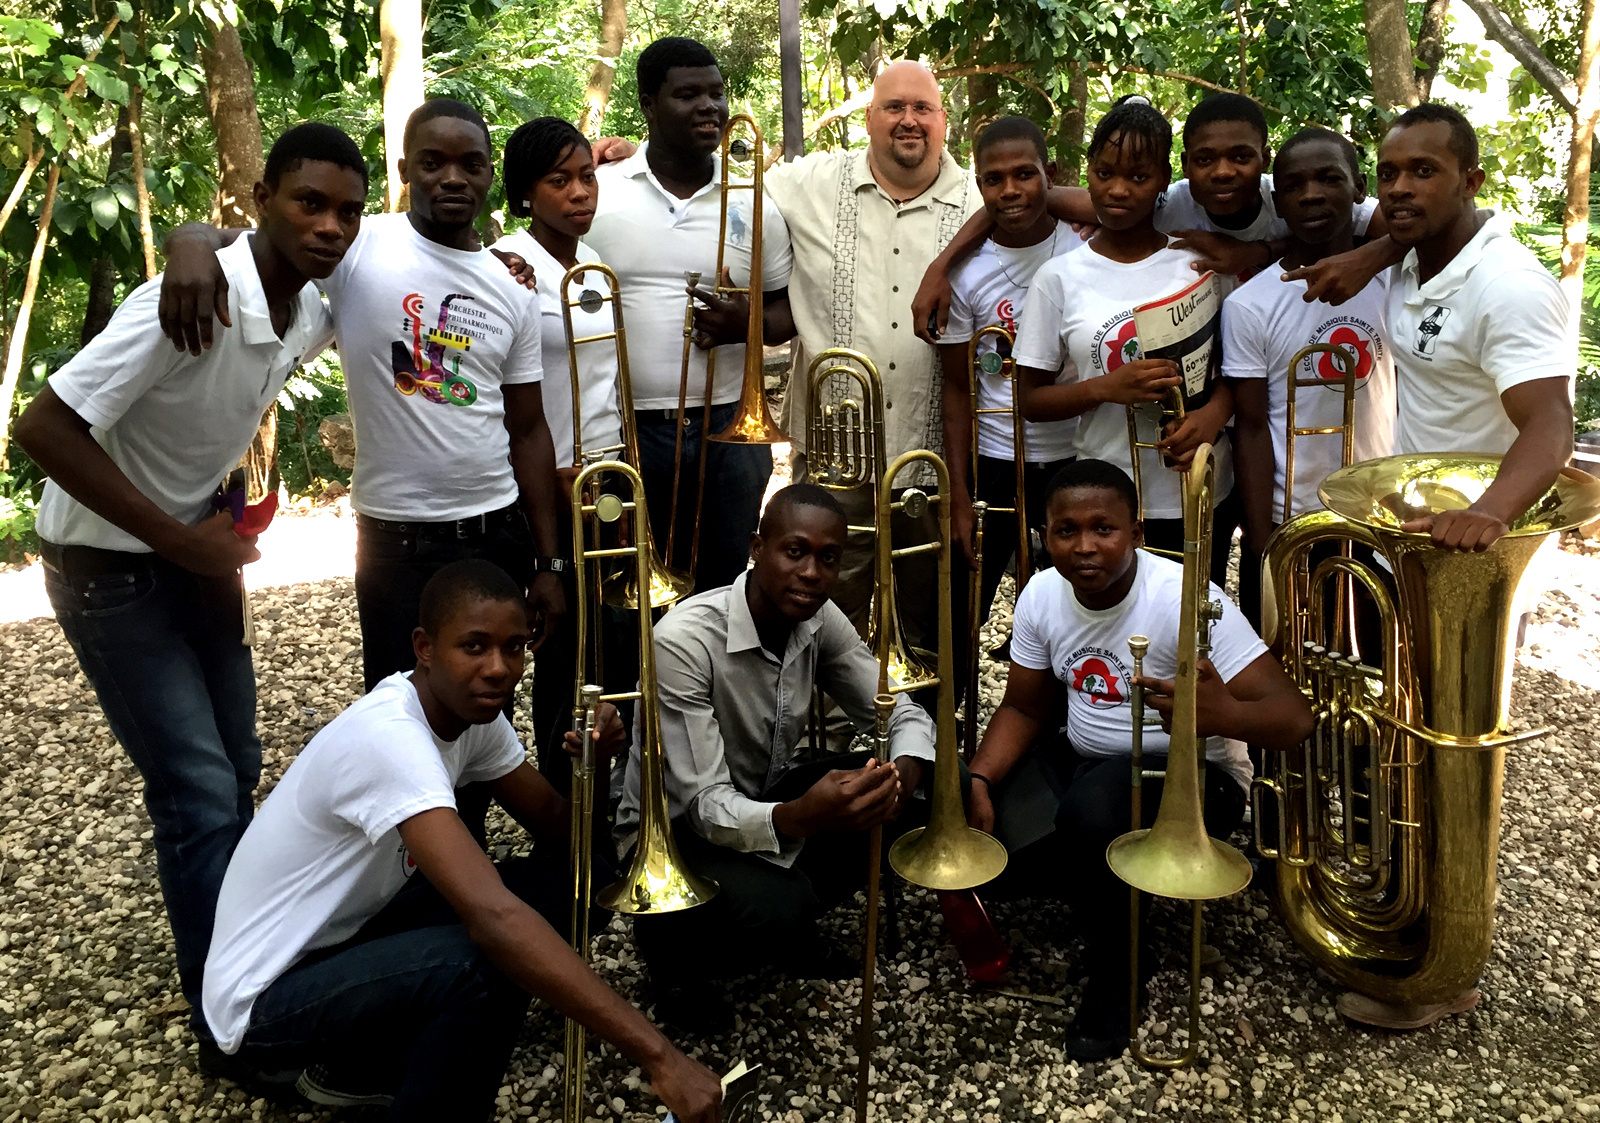 SHU band director teaches music in Haiti - Connecticut Post